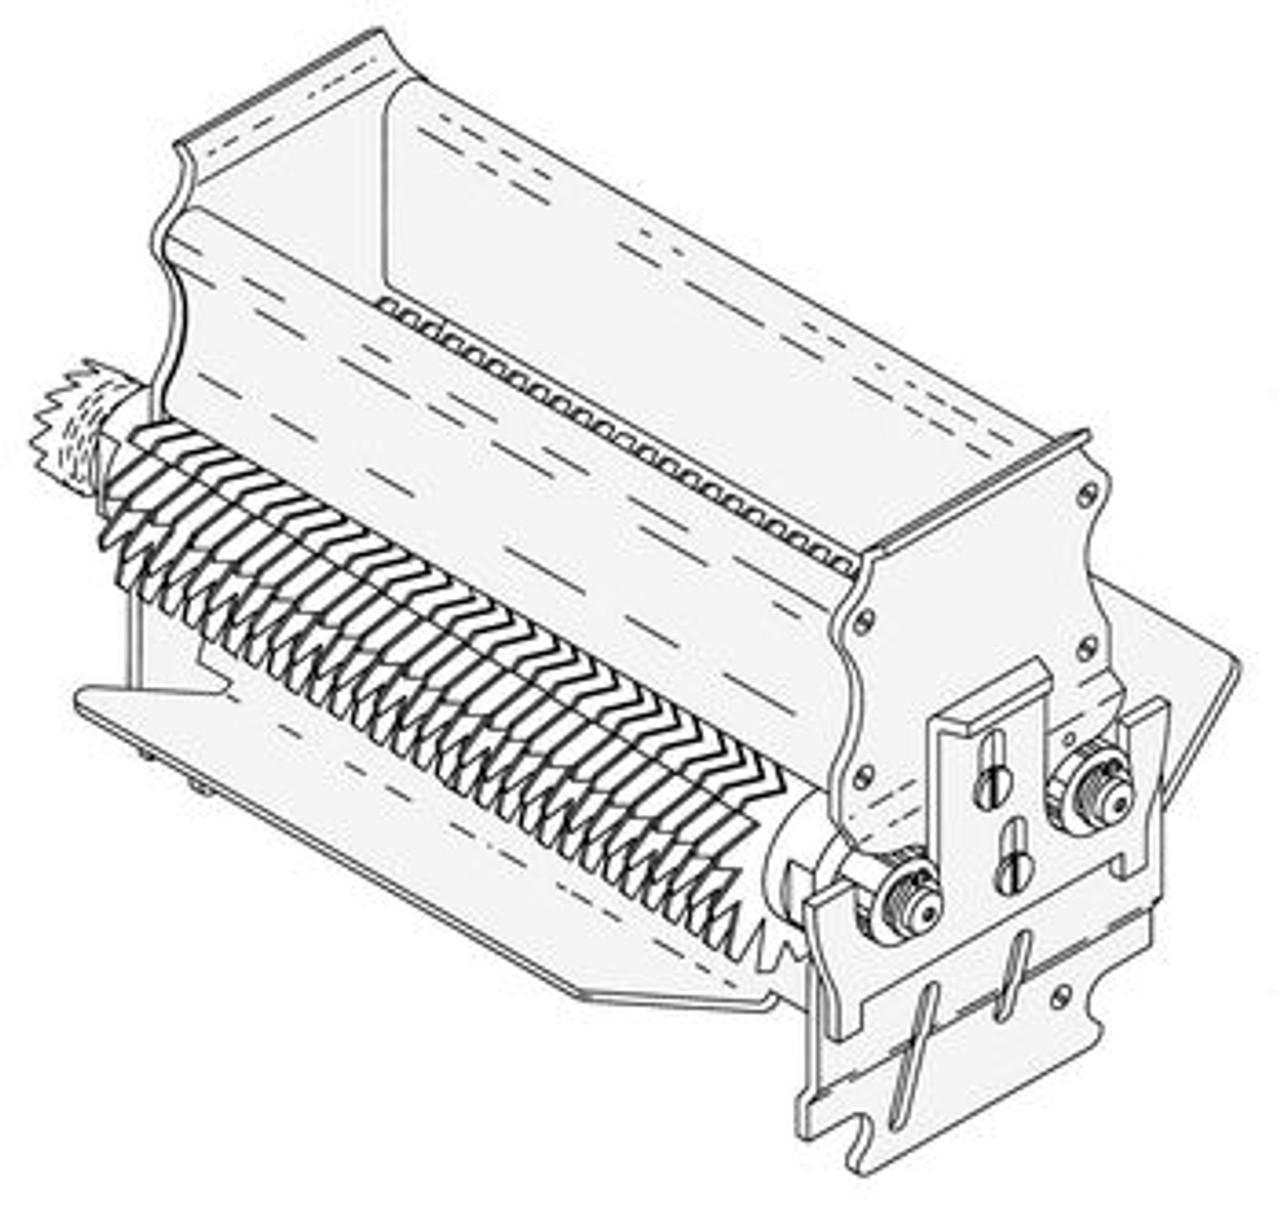 Berkel Complete Blade Frame Assembly - BT020A